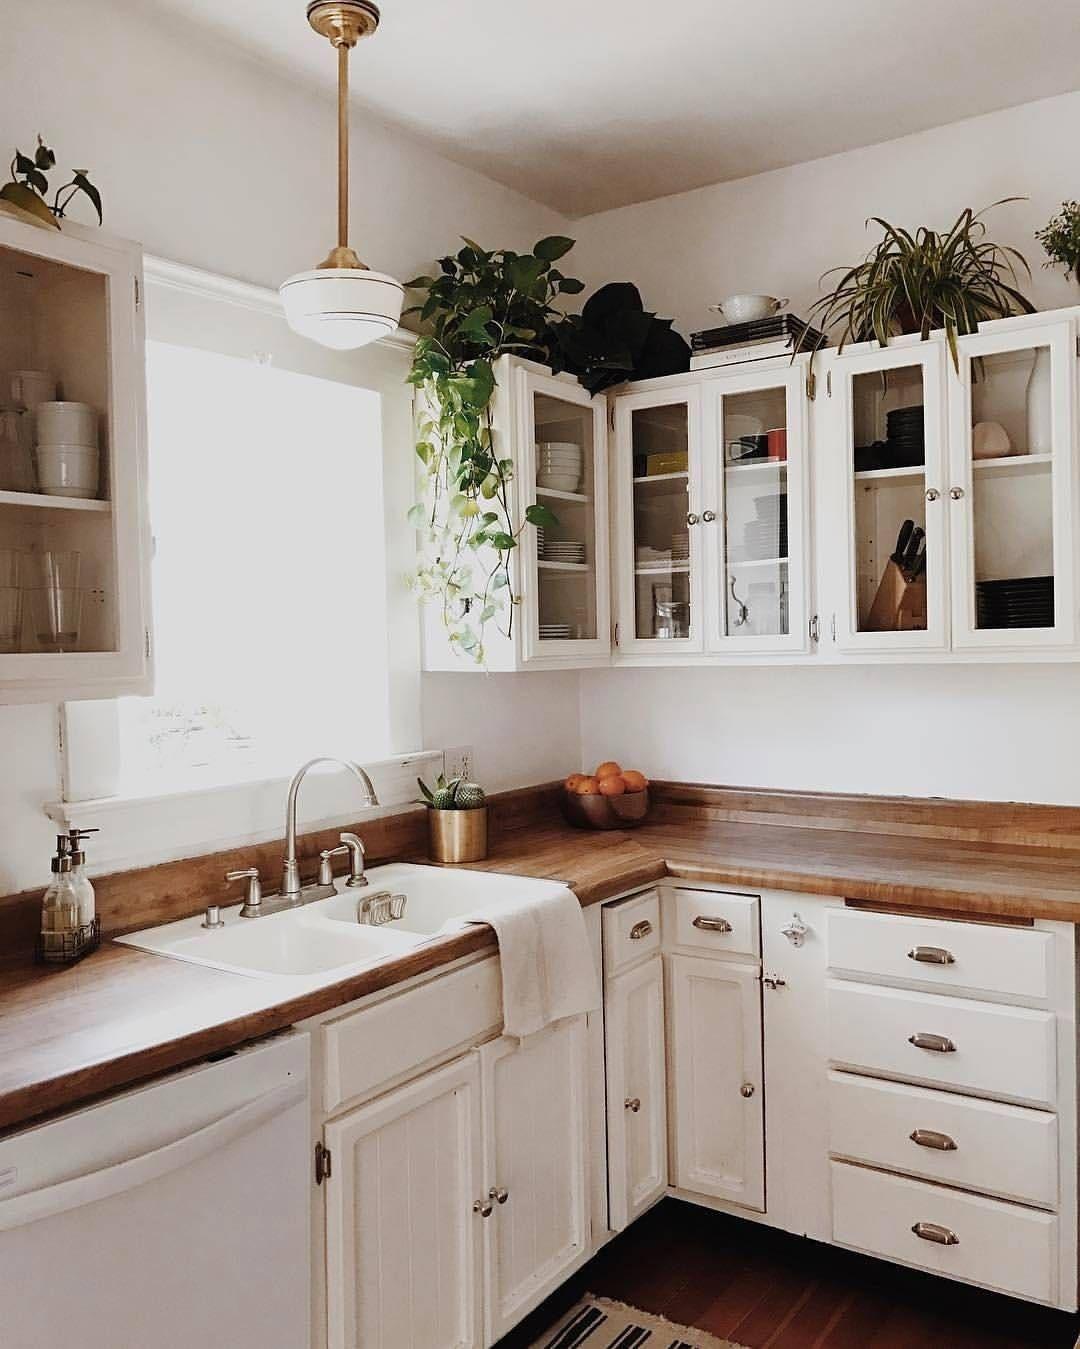 Yes To This Pleasant Kitchen Scene Unionpendant Brassplanter Schoolhouseelectric Via Branchabode Shop Th Kitchen Remodel Retro Home Decor Home Kitchens